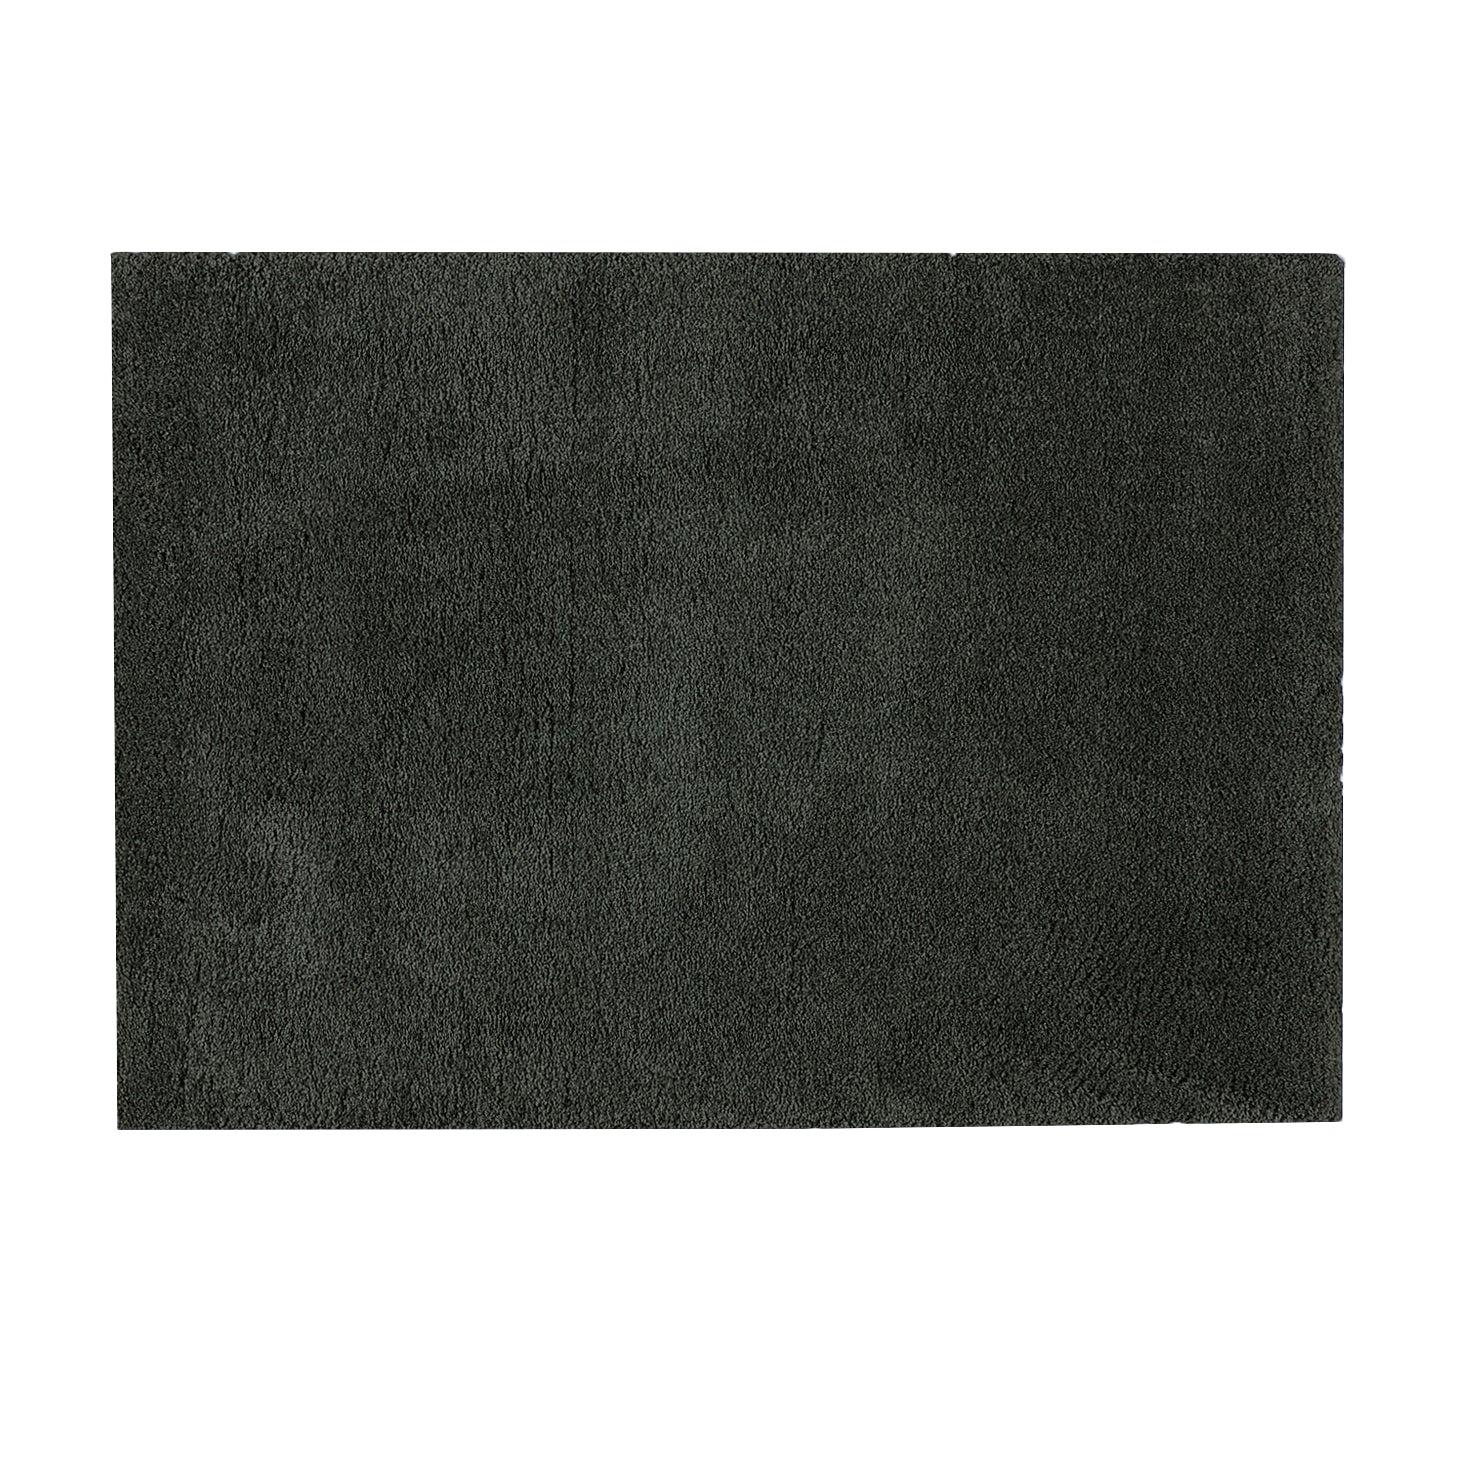 Nimara.dk Doris - Ryatæppe i grå 140x200 cm